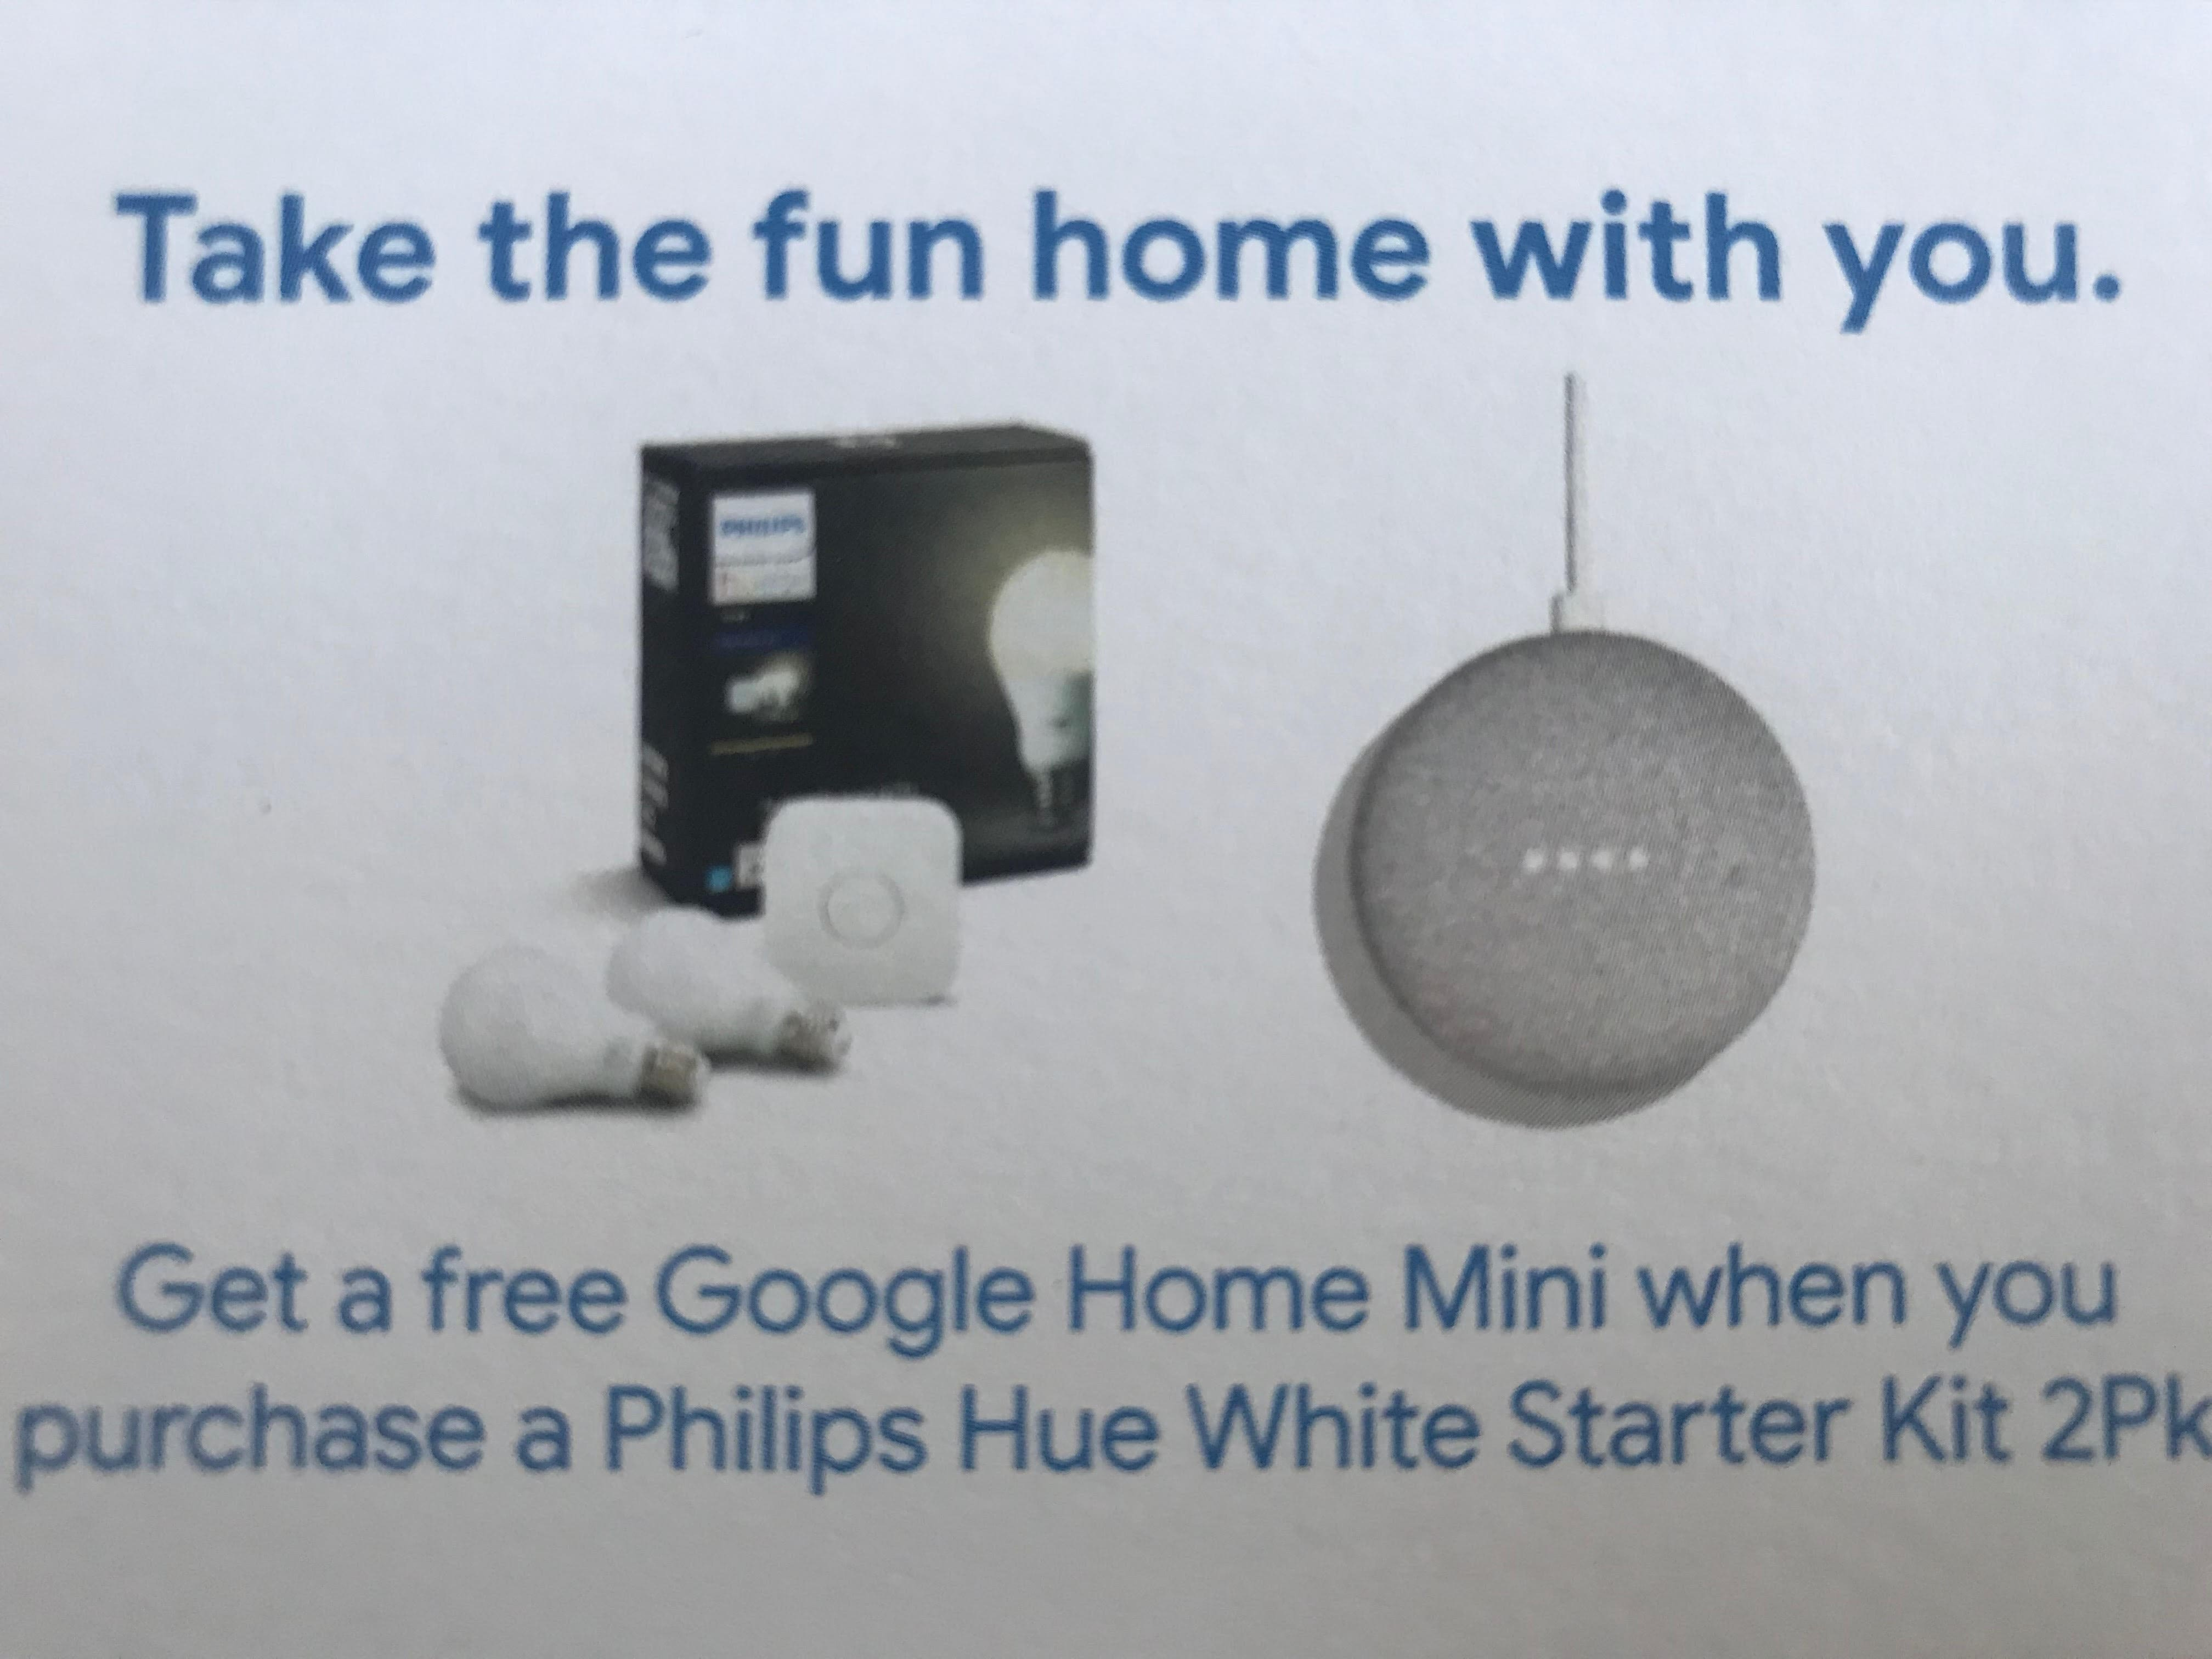 Google Home Mini with Philips Hue White Starter Kit $70